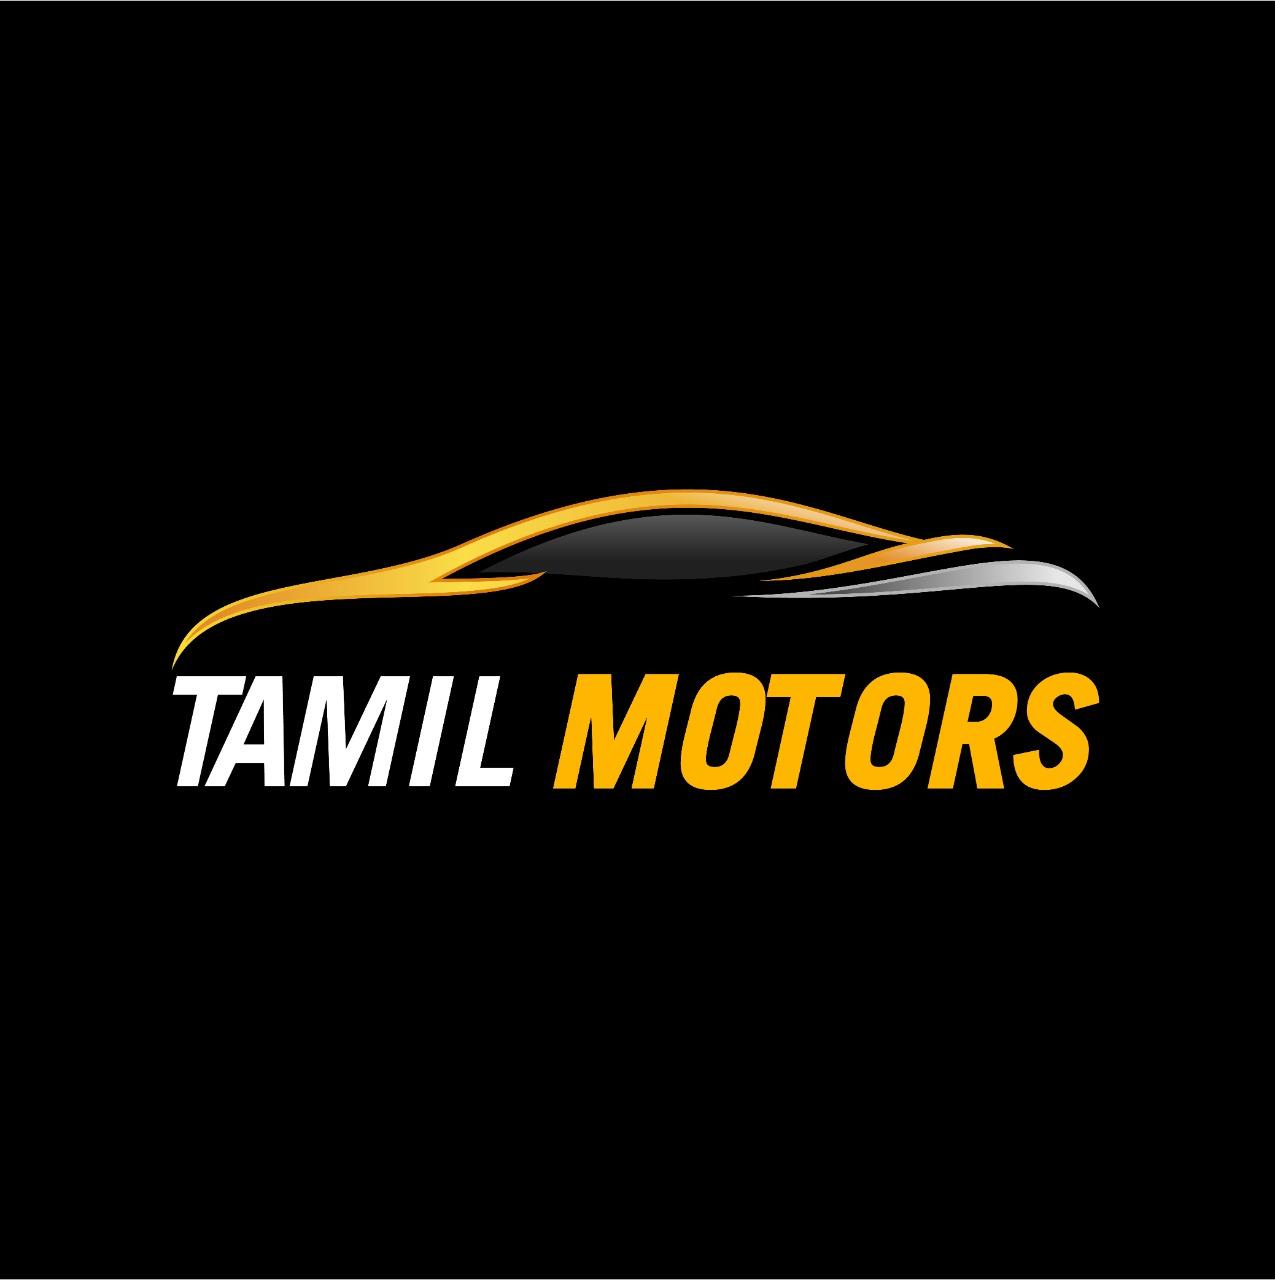 Tamil Motors Ltd logo